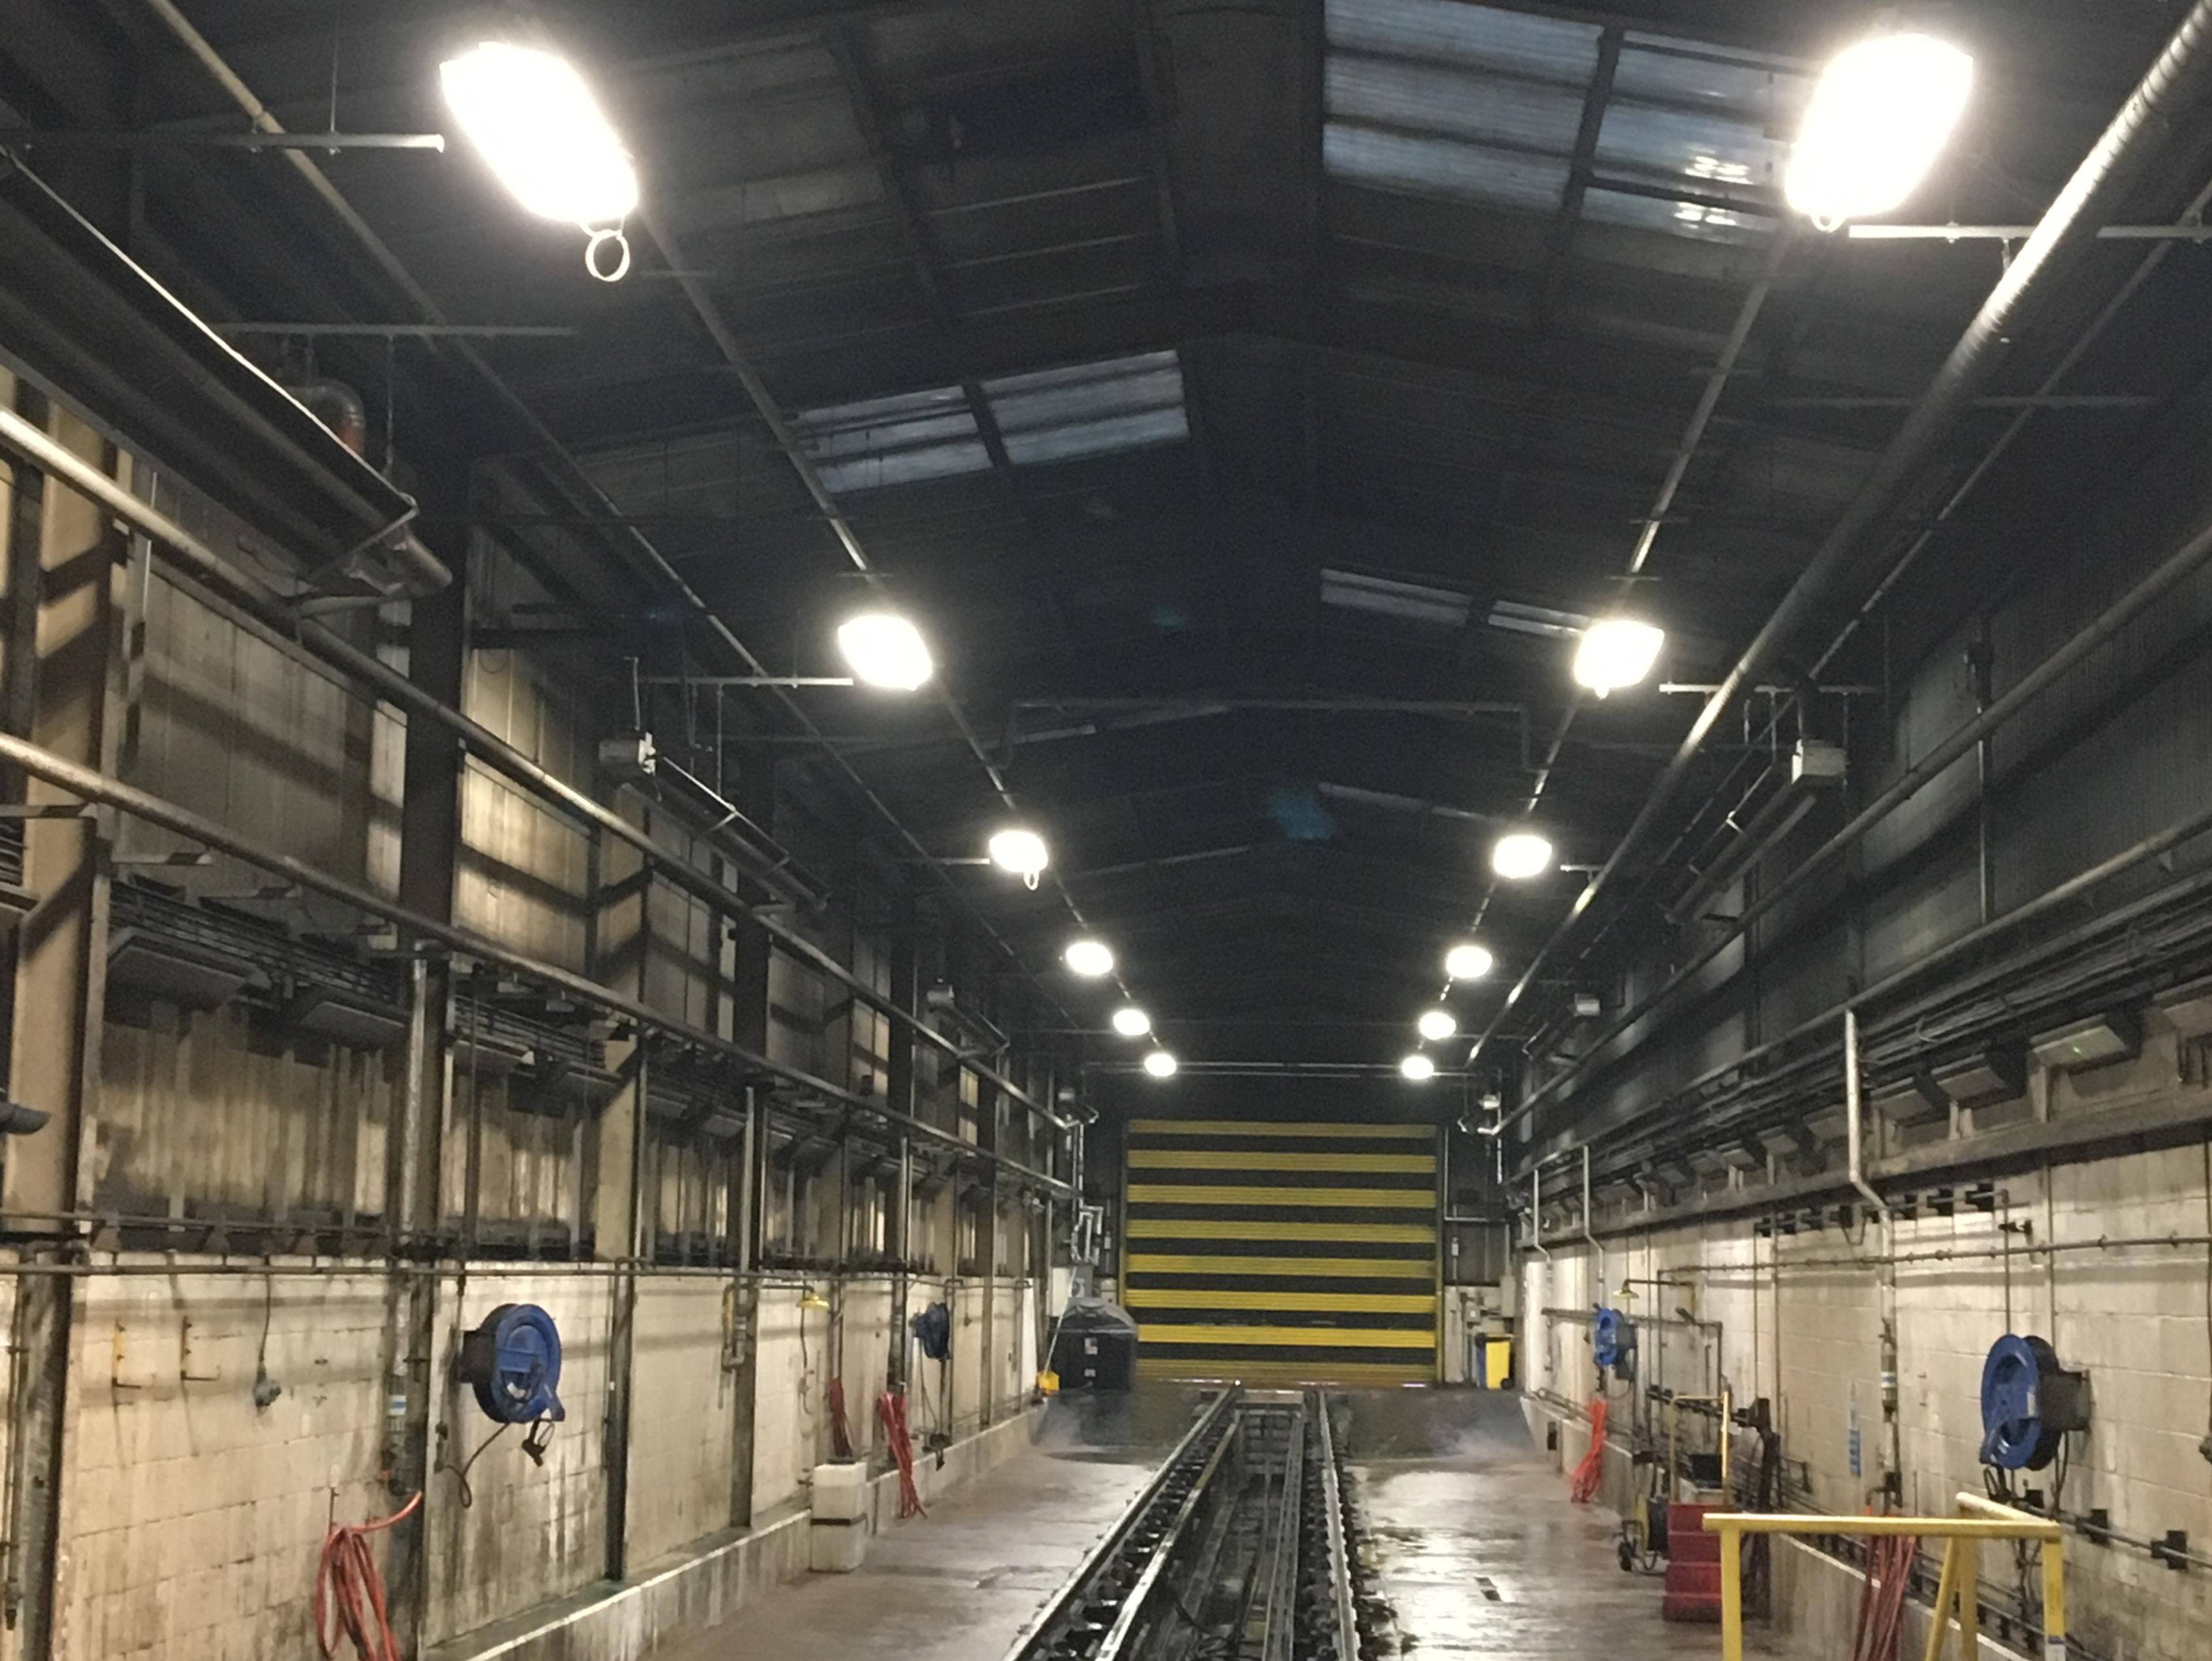 Neville Hill Depot - Highlite